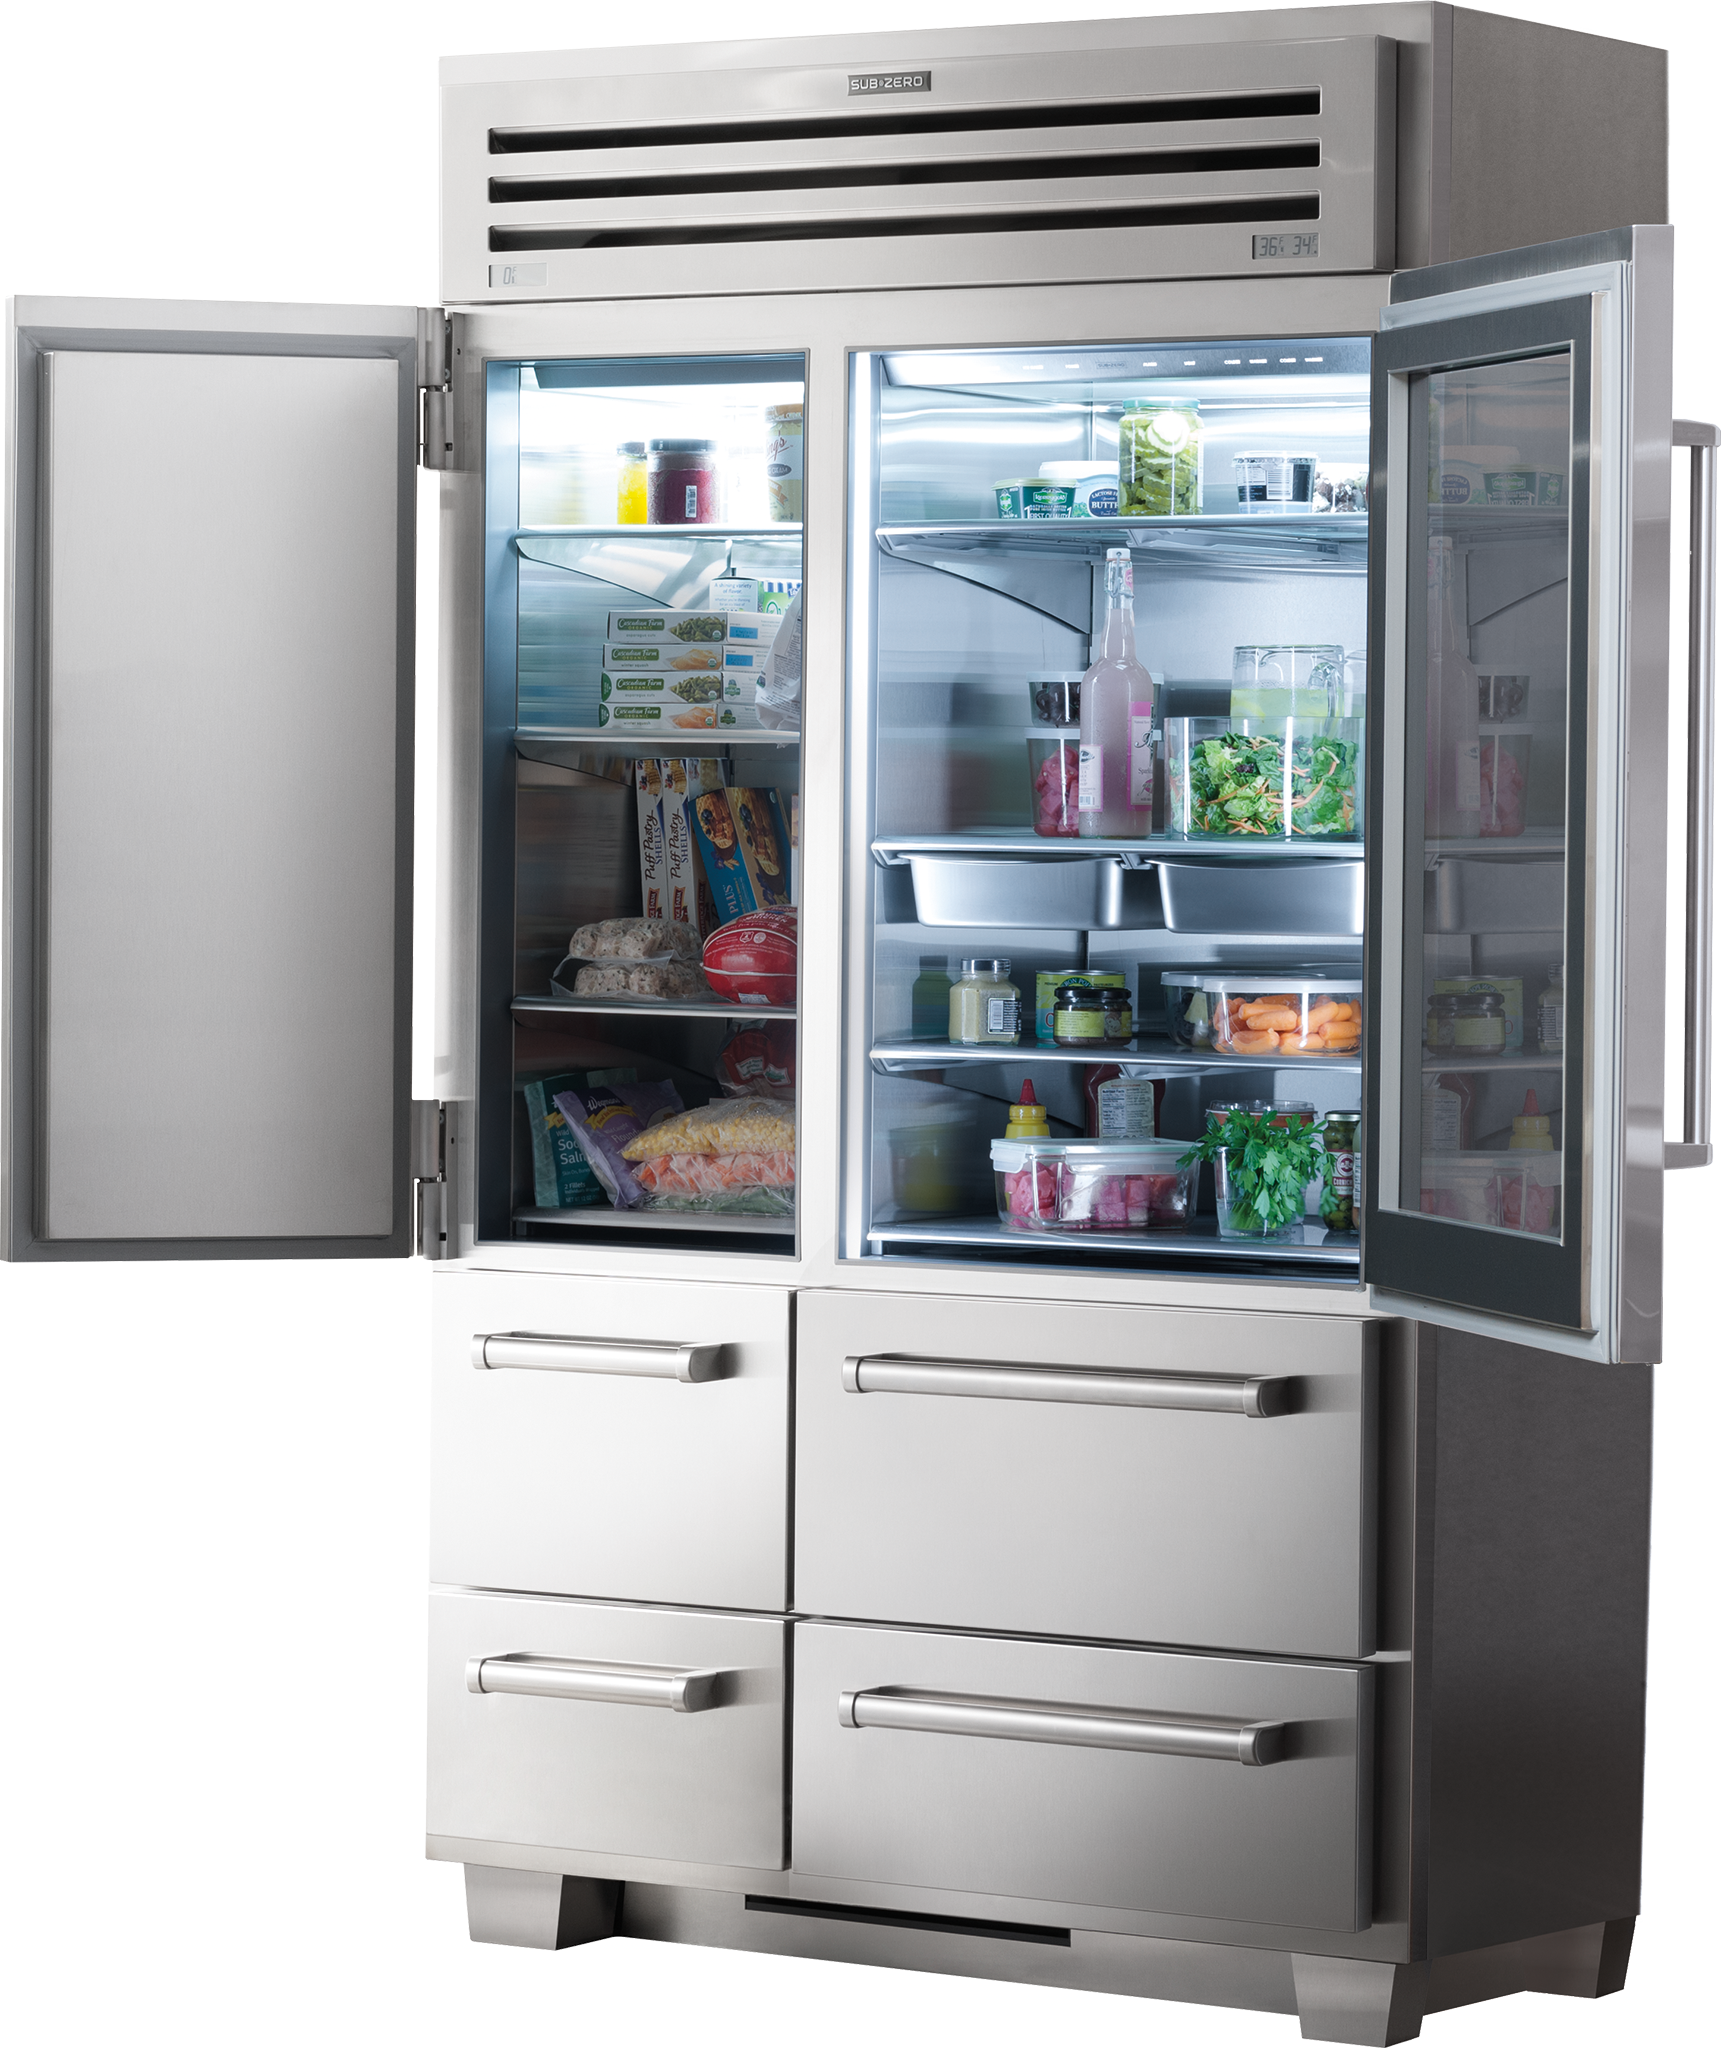 Sub Zero 48 Panel Ready Refrigerator